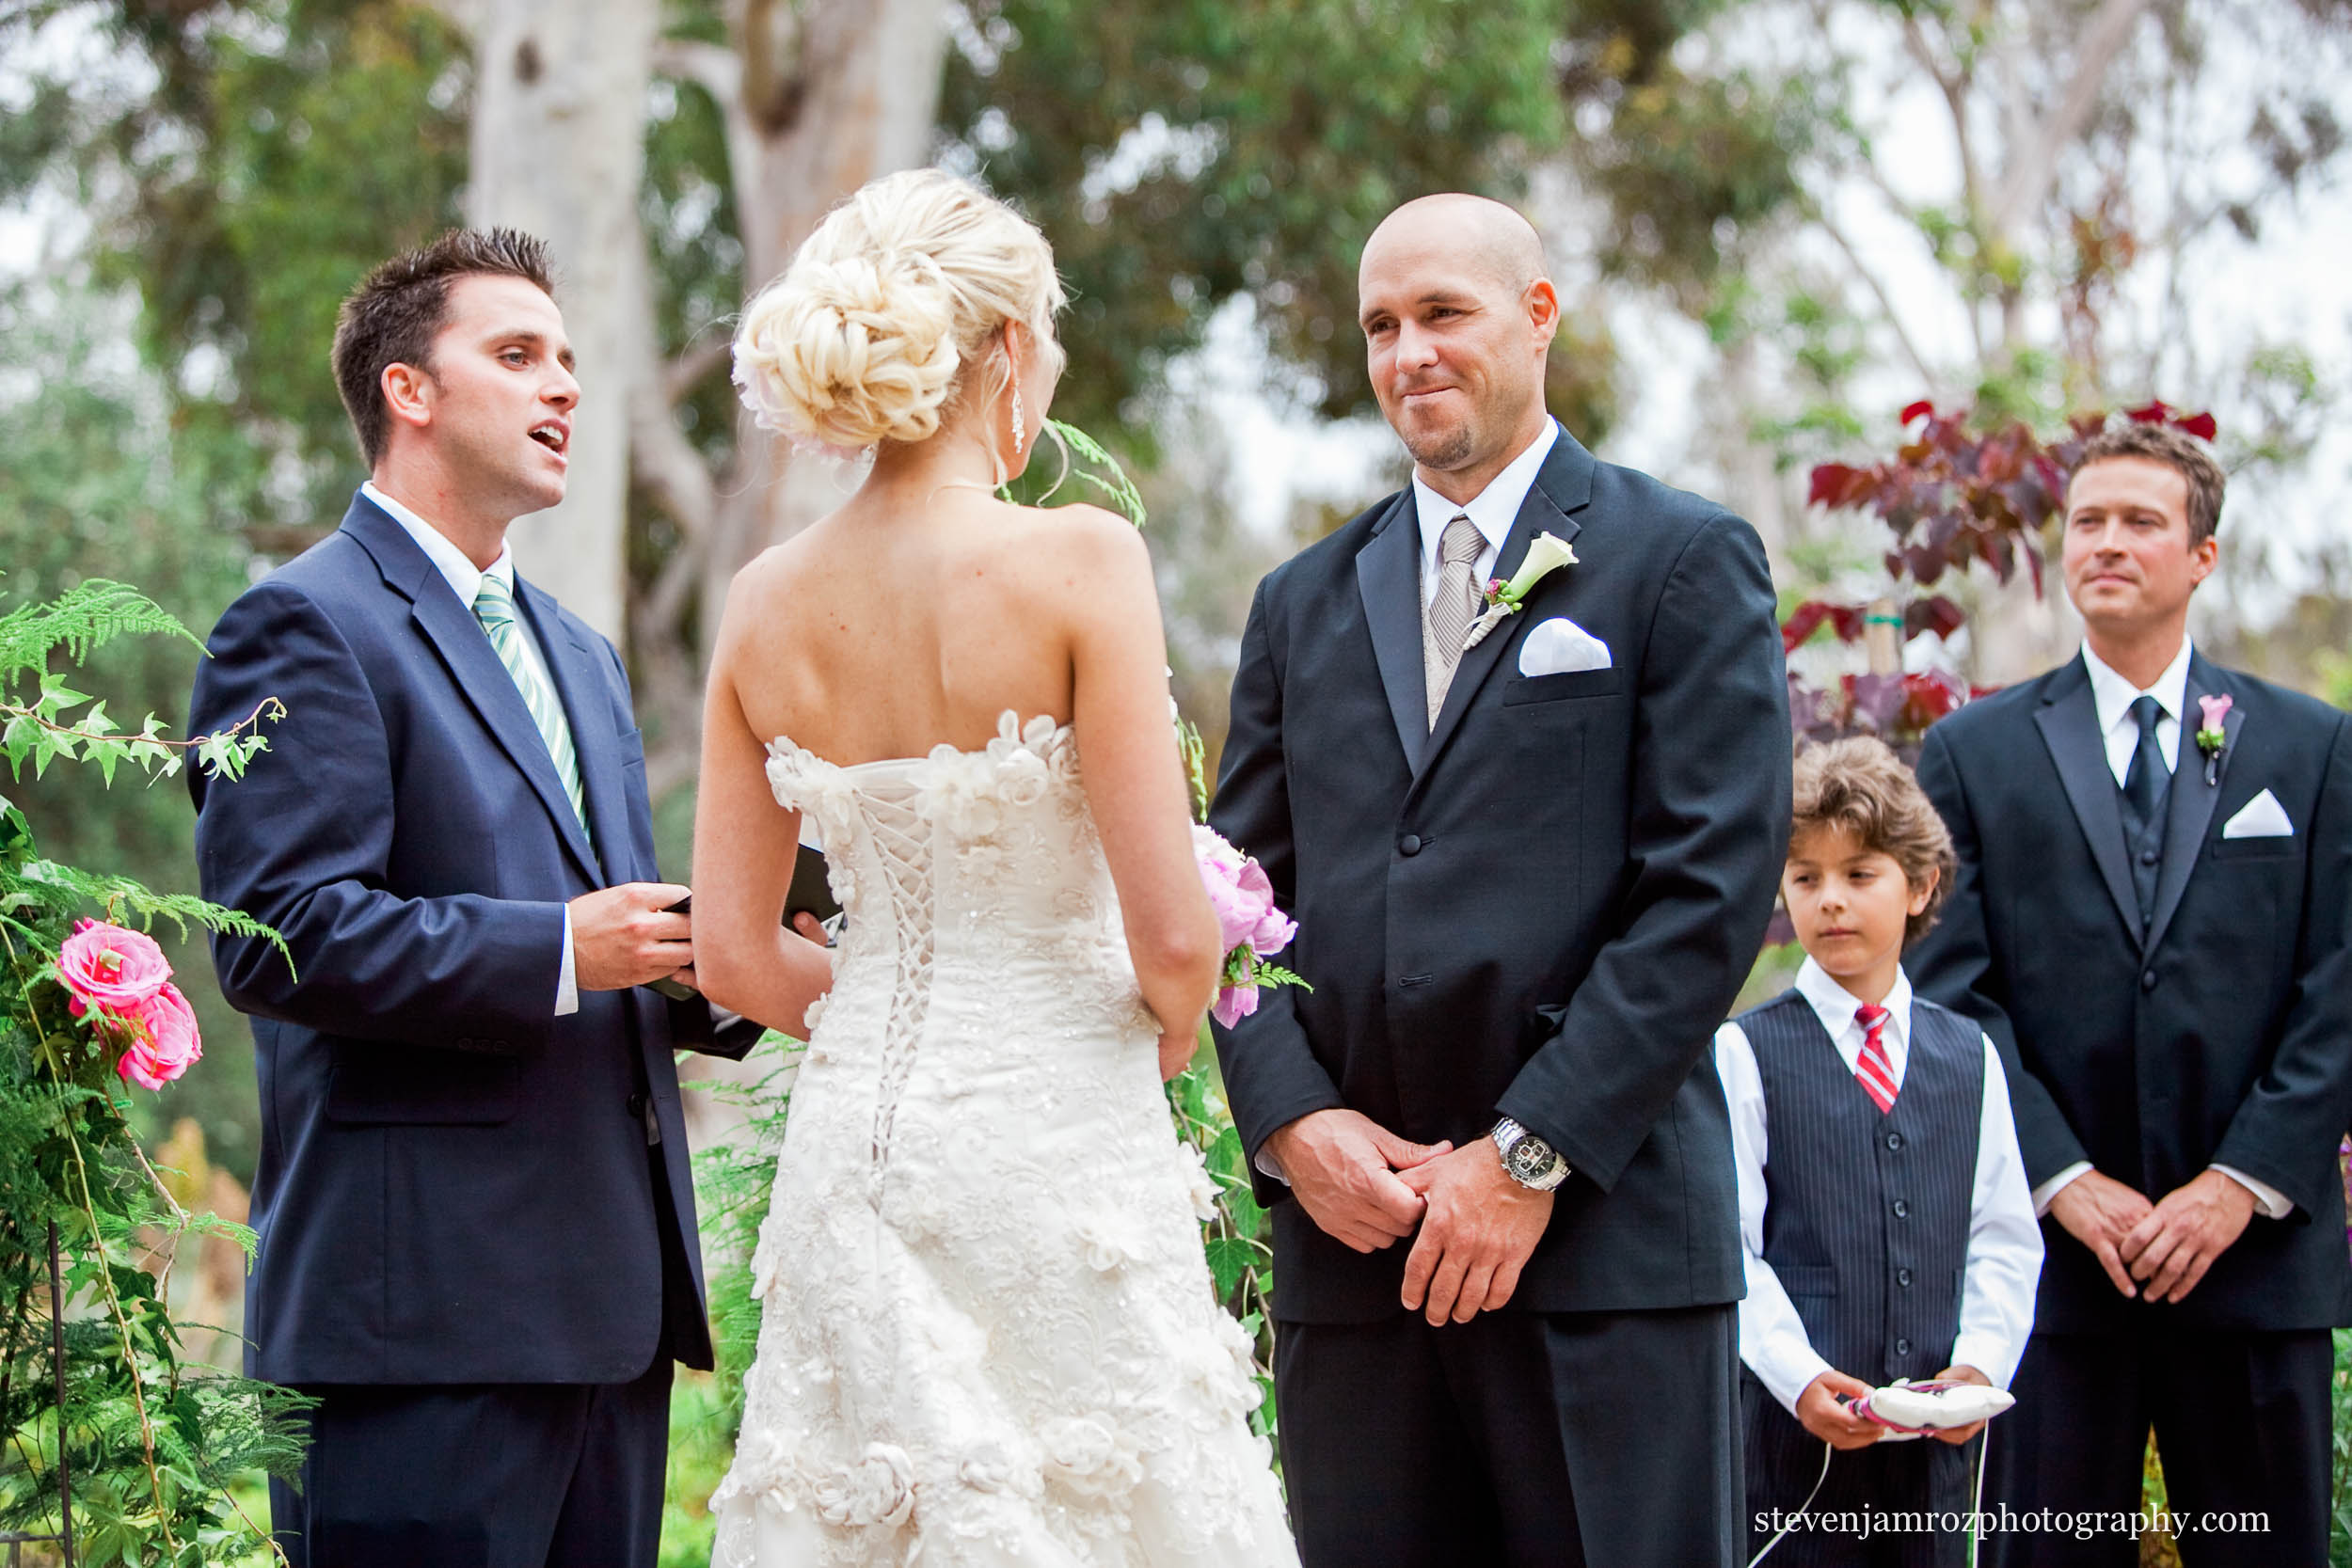 photojournalism-wedding-raleigh-nc-steven-jamroz-0722.jpg